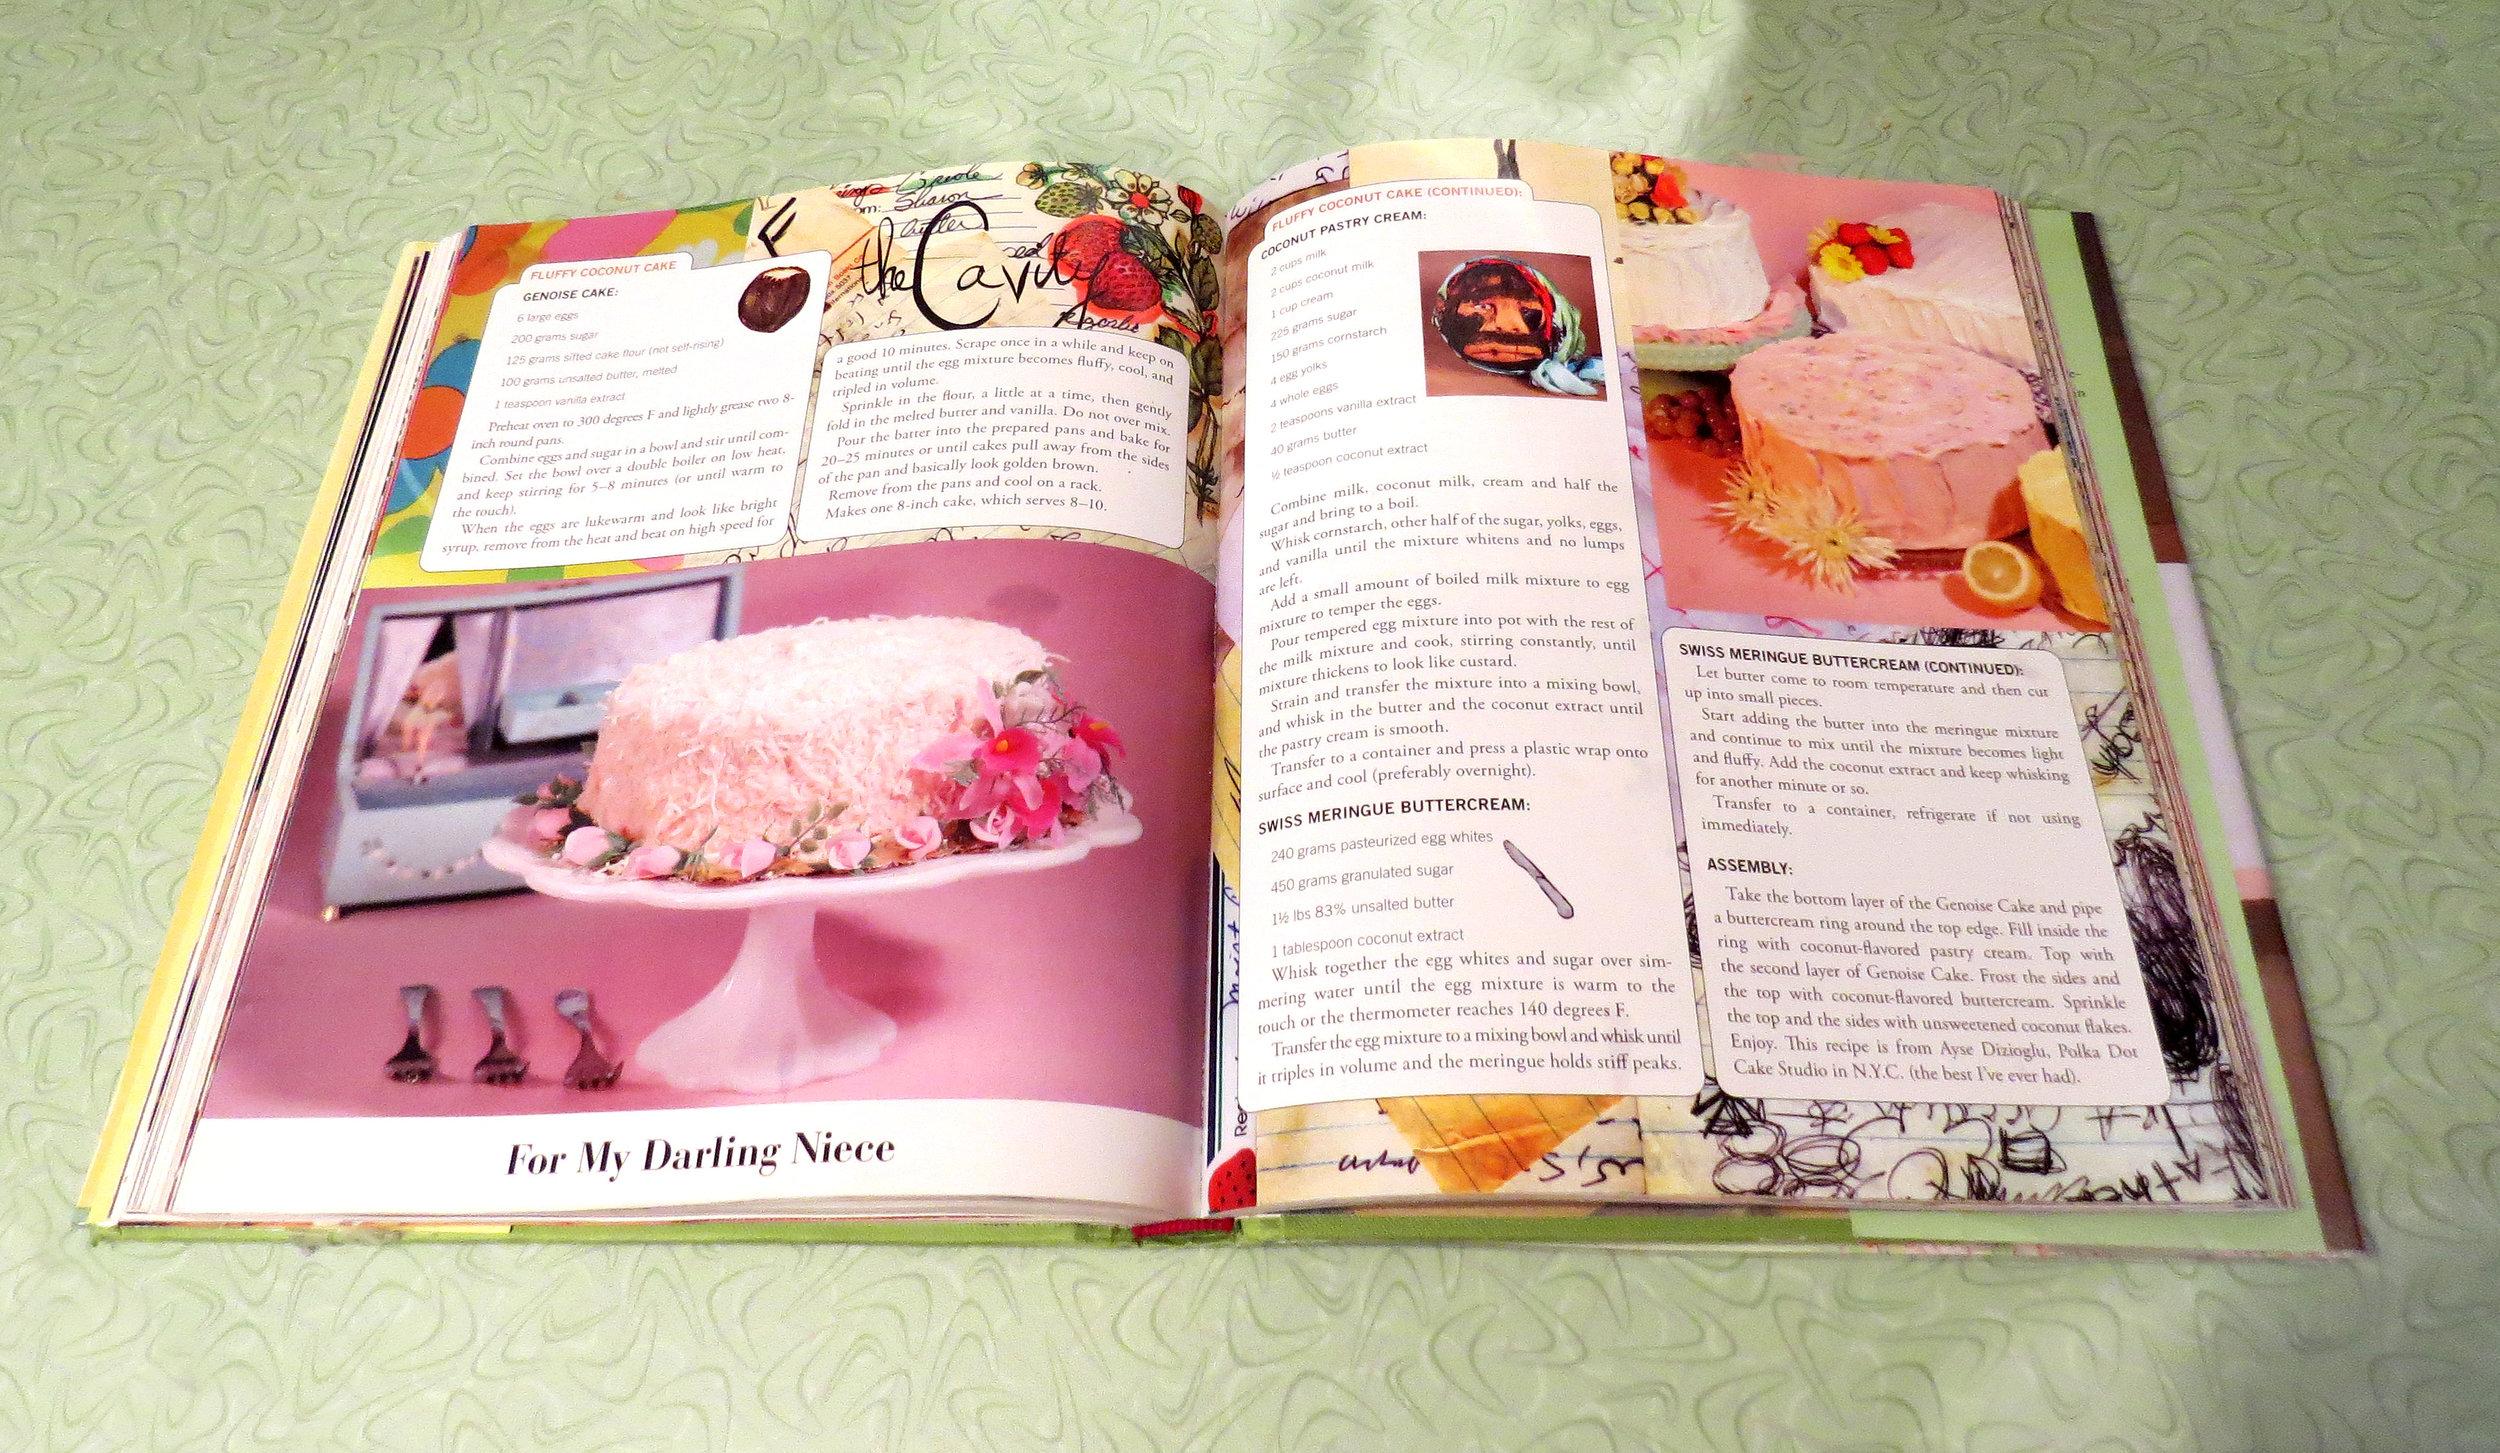 The recipe for coconut cake